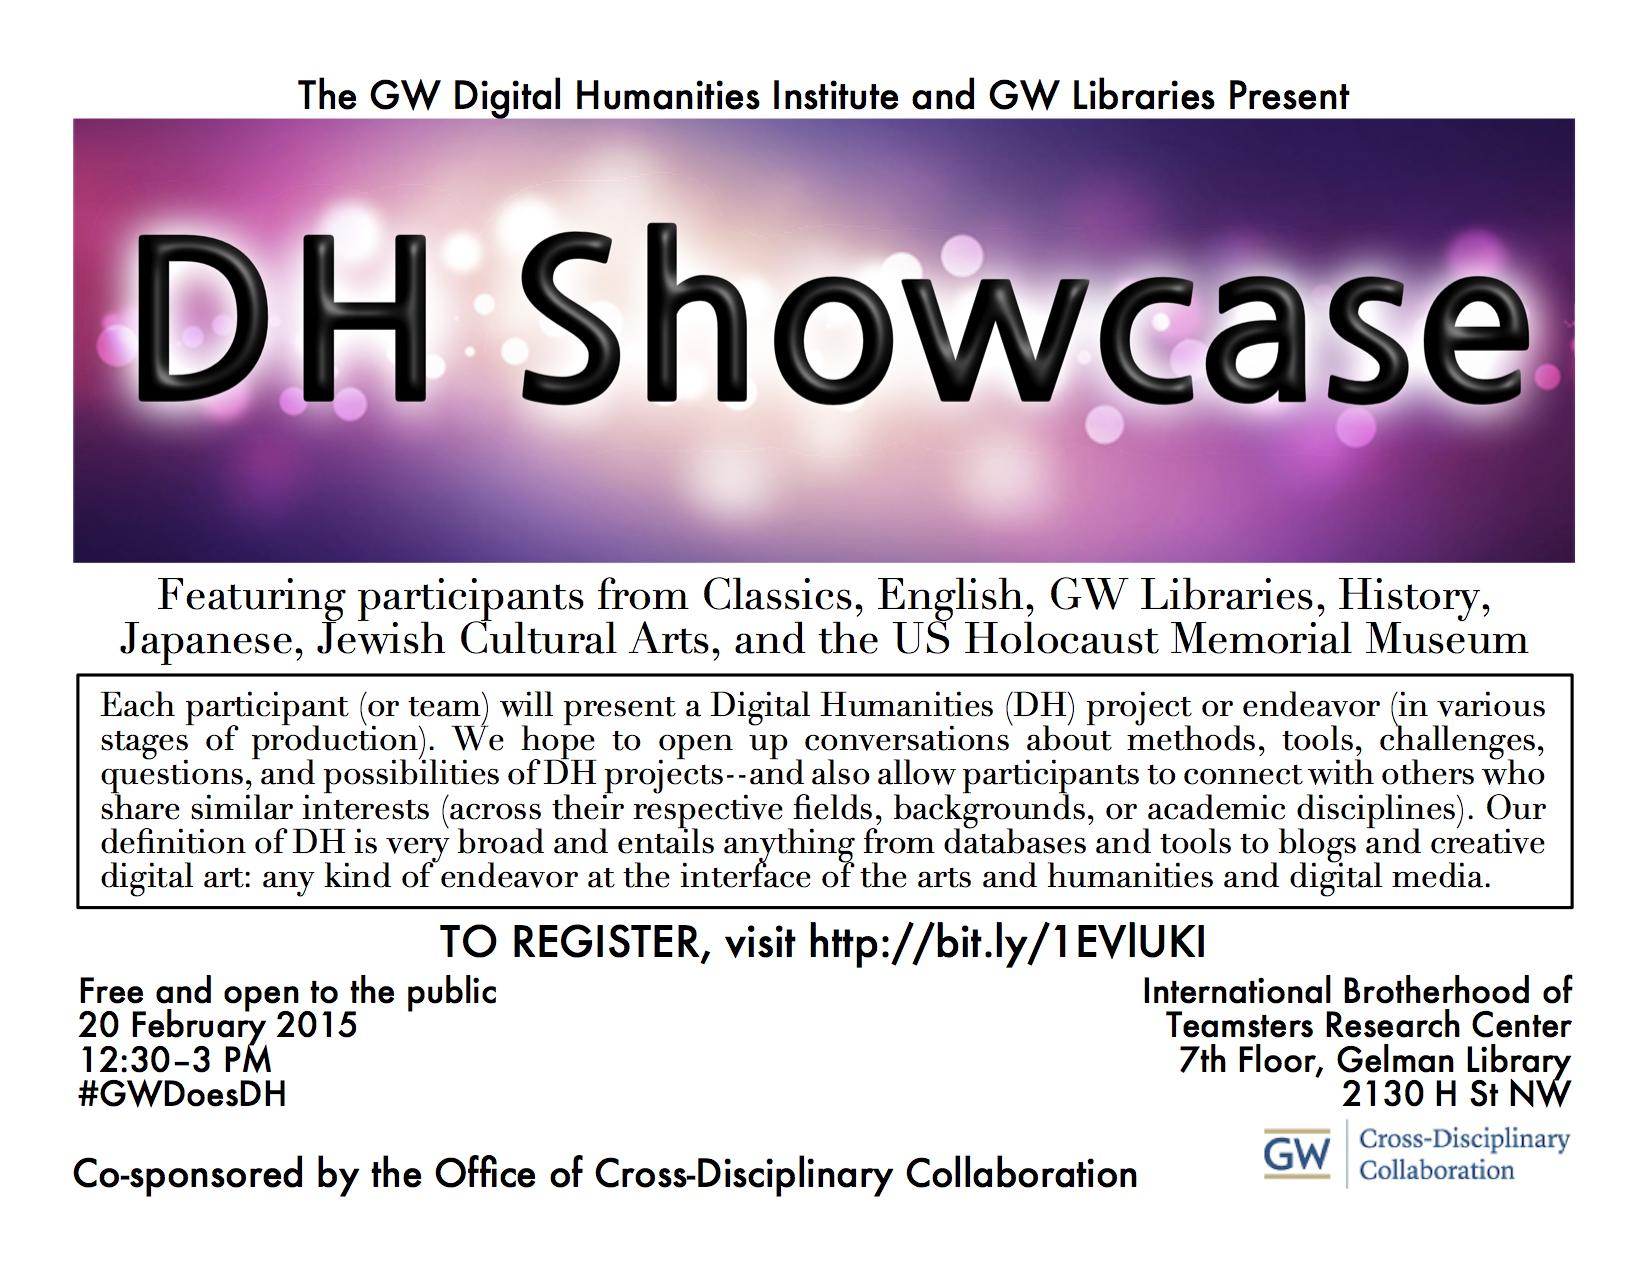 DH Showcase 2015 - flyer